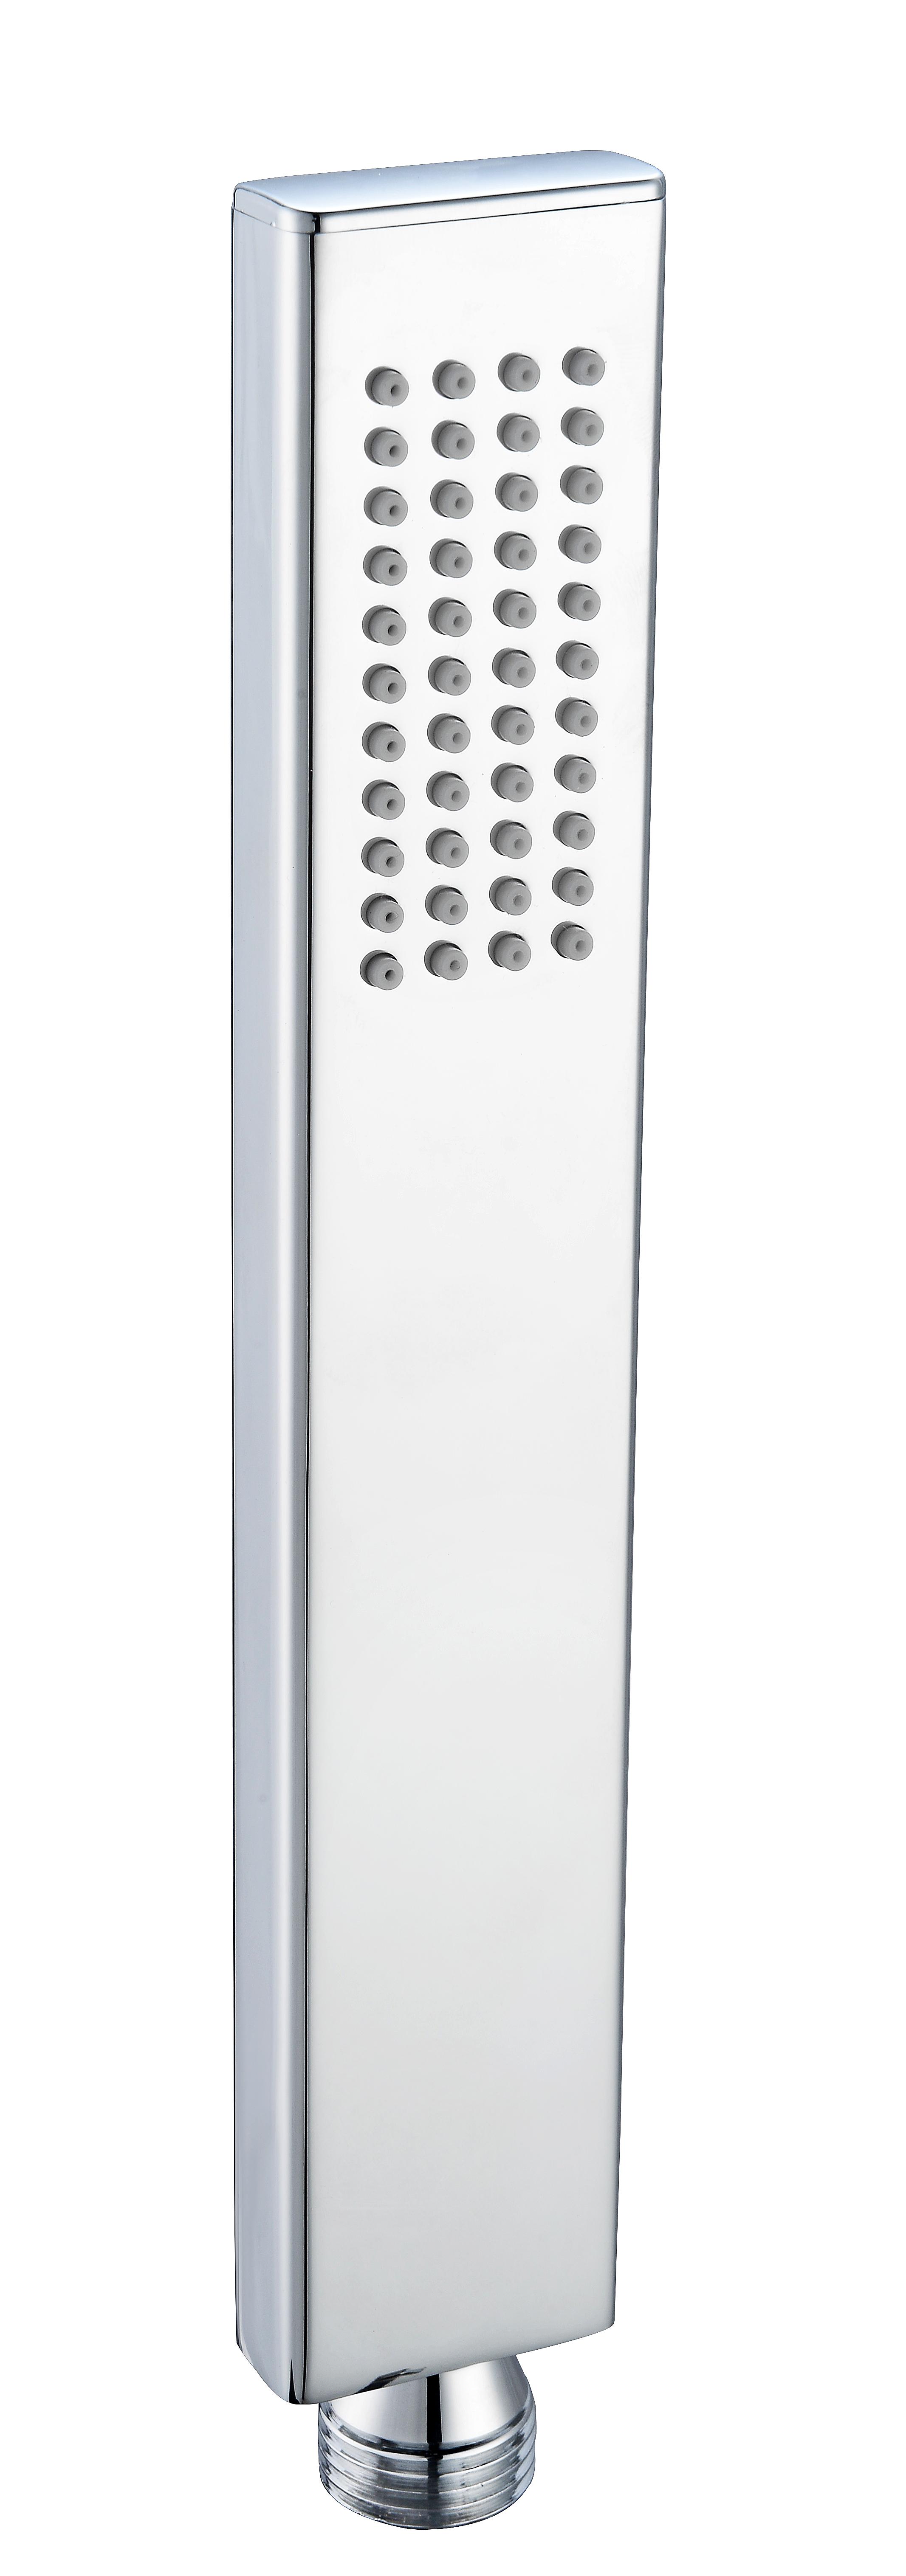 Messing - Handbrause HB-8364